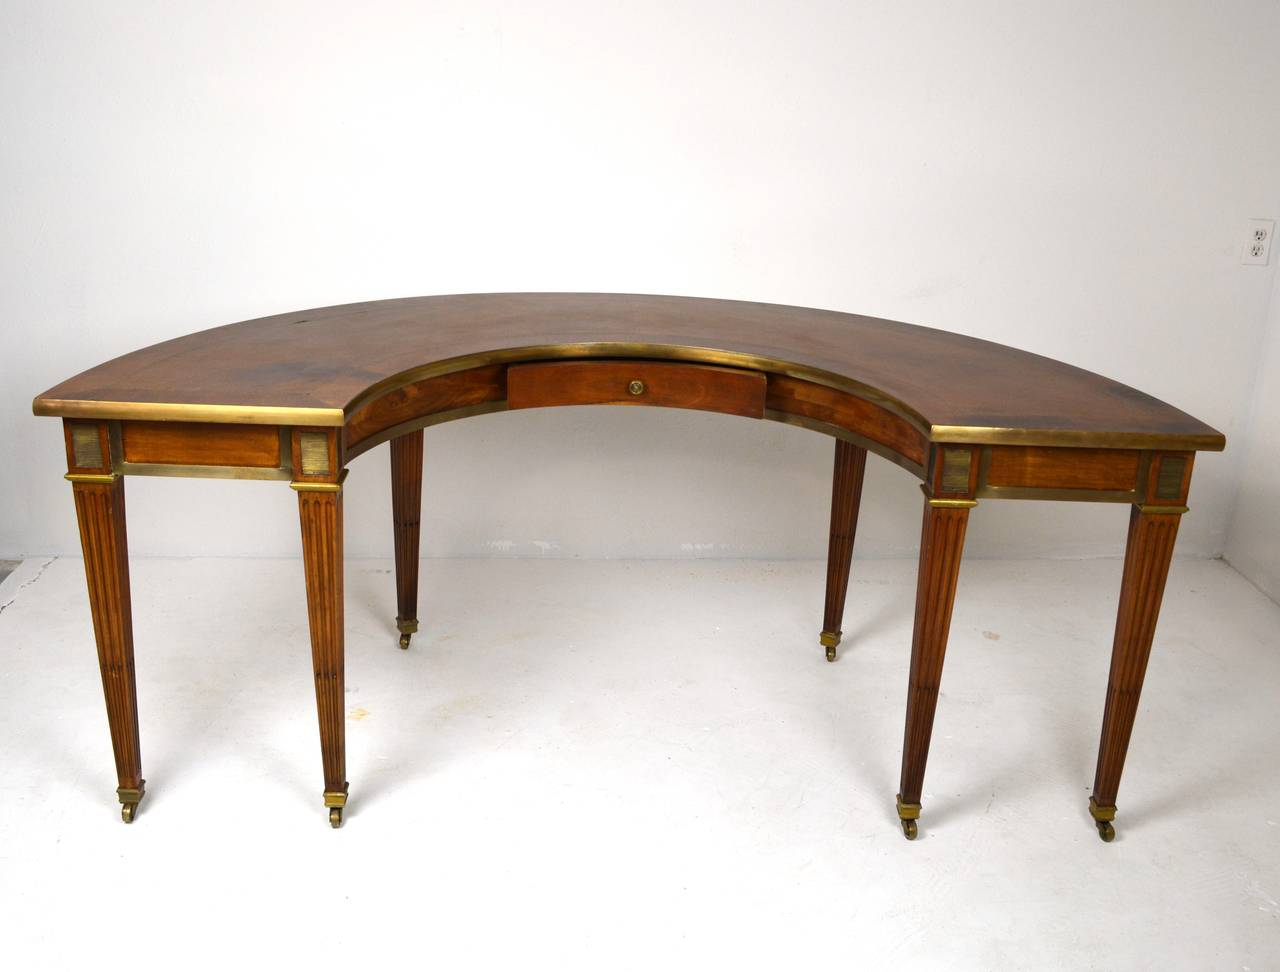 Etonnant Elegant Neo Classical Style Hunt Table Or Desk